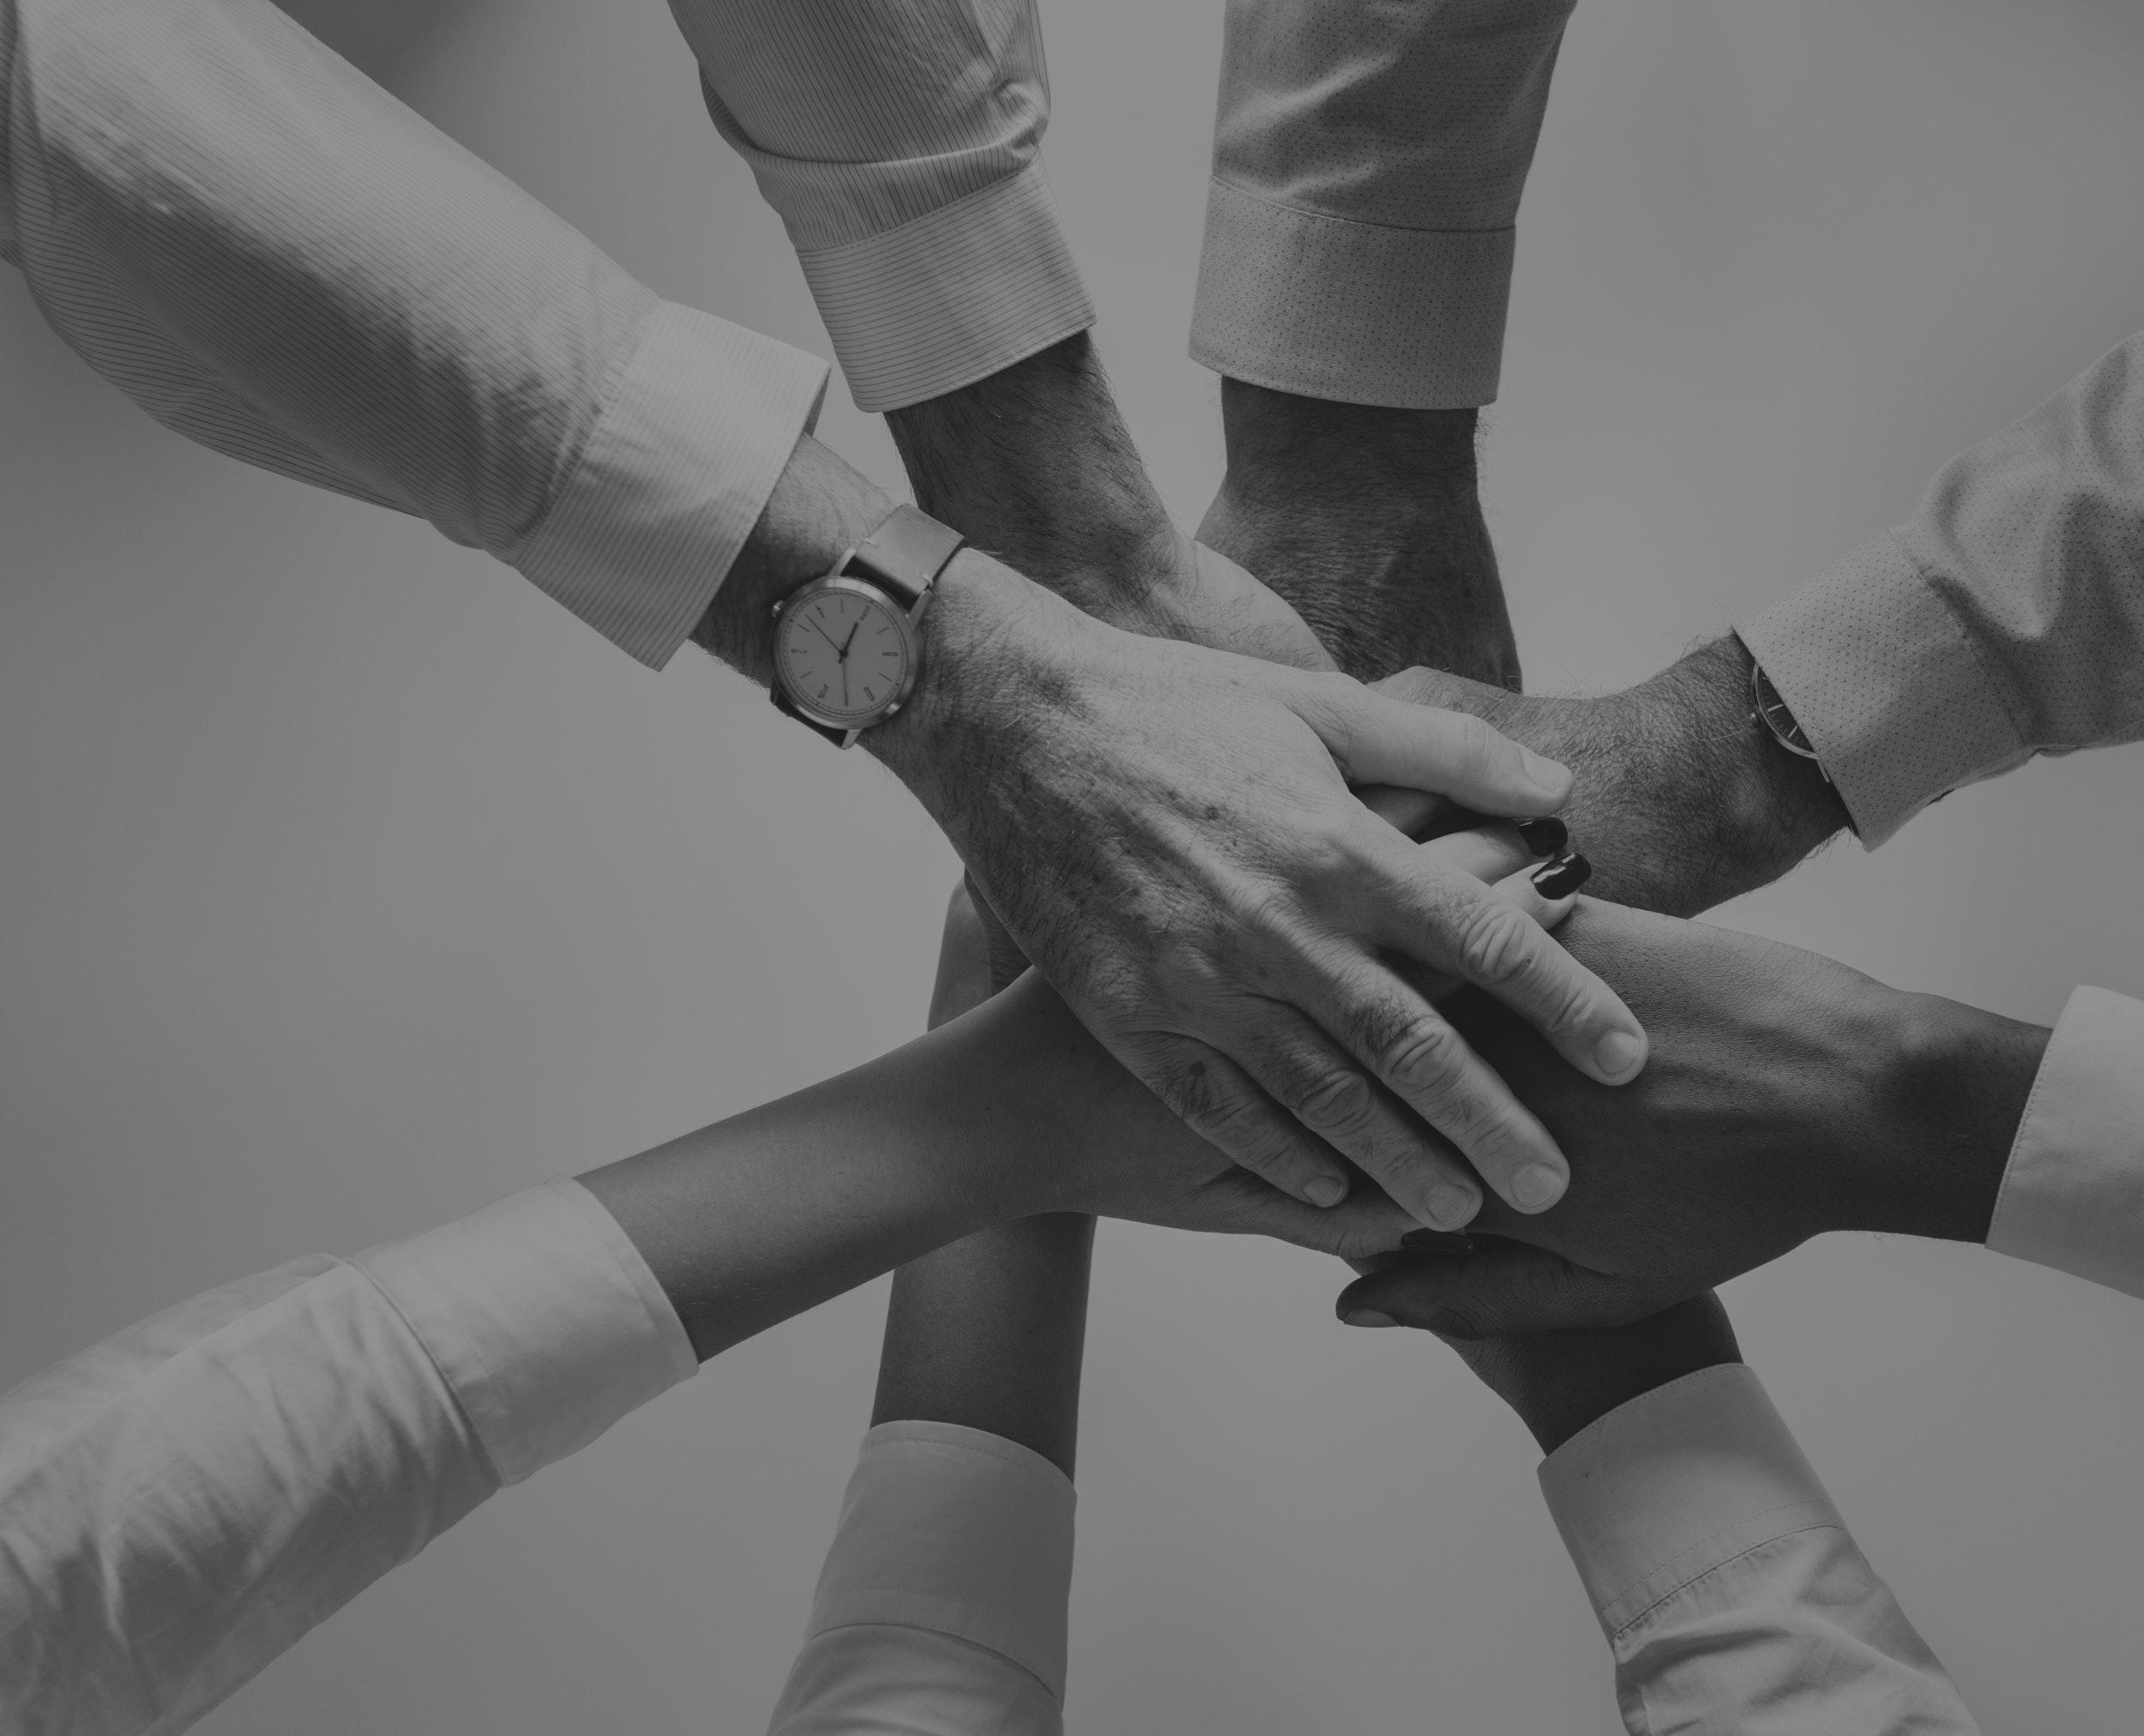 Evolution Institute Announcement for Participation in Behavior Science Coalition